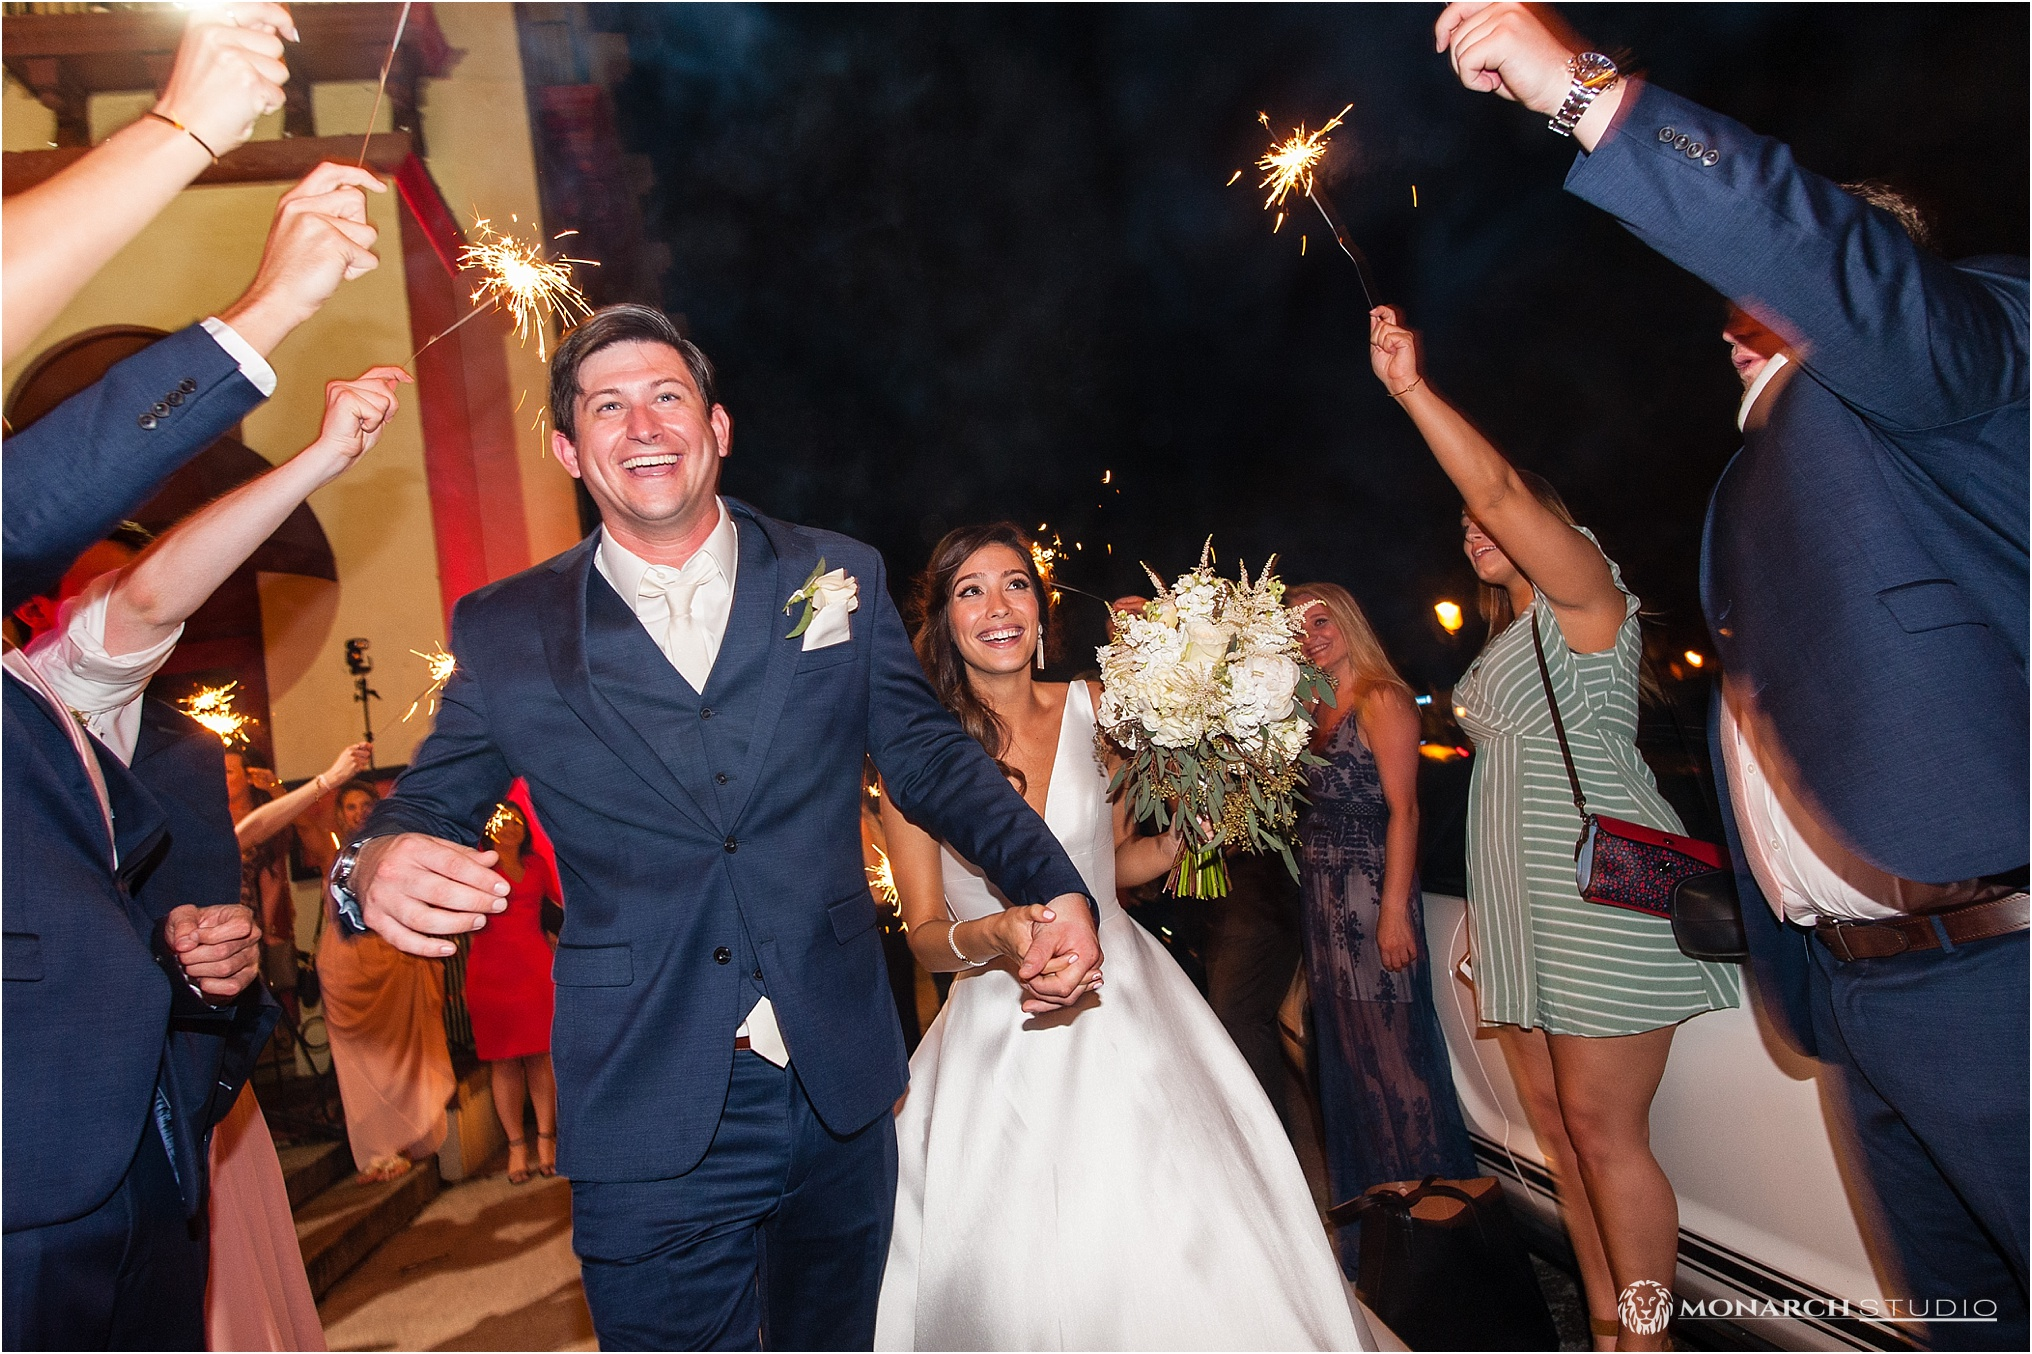 st-augustine-wedding-photographer-155.jpg